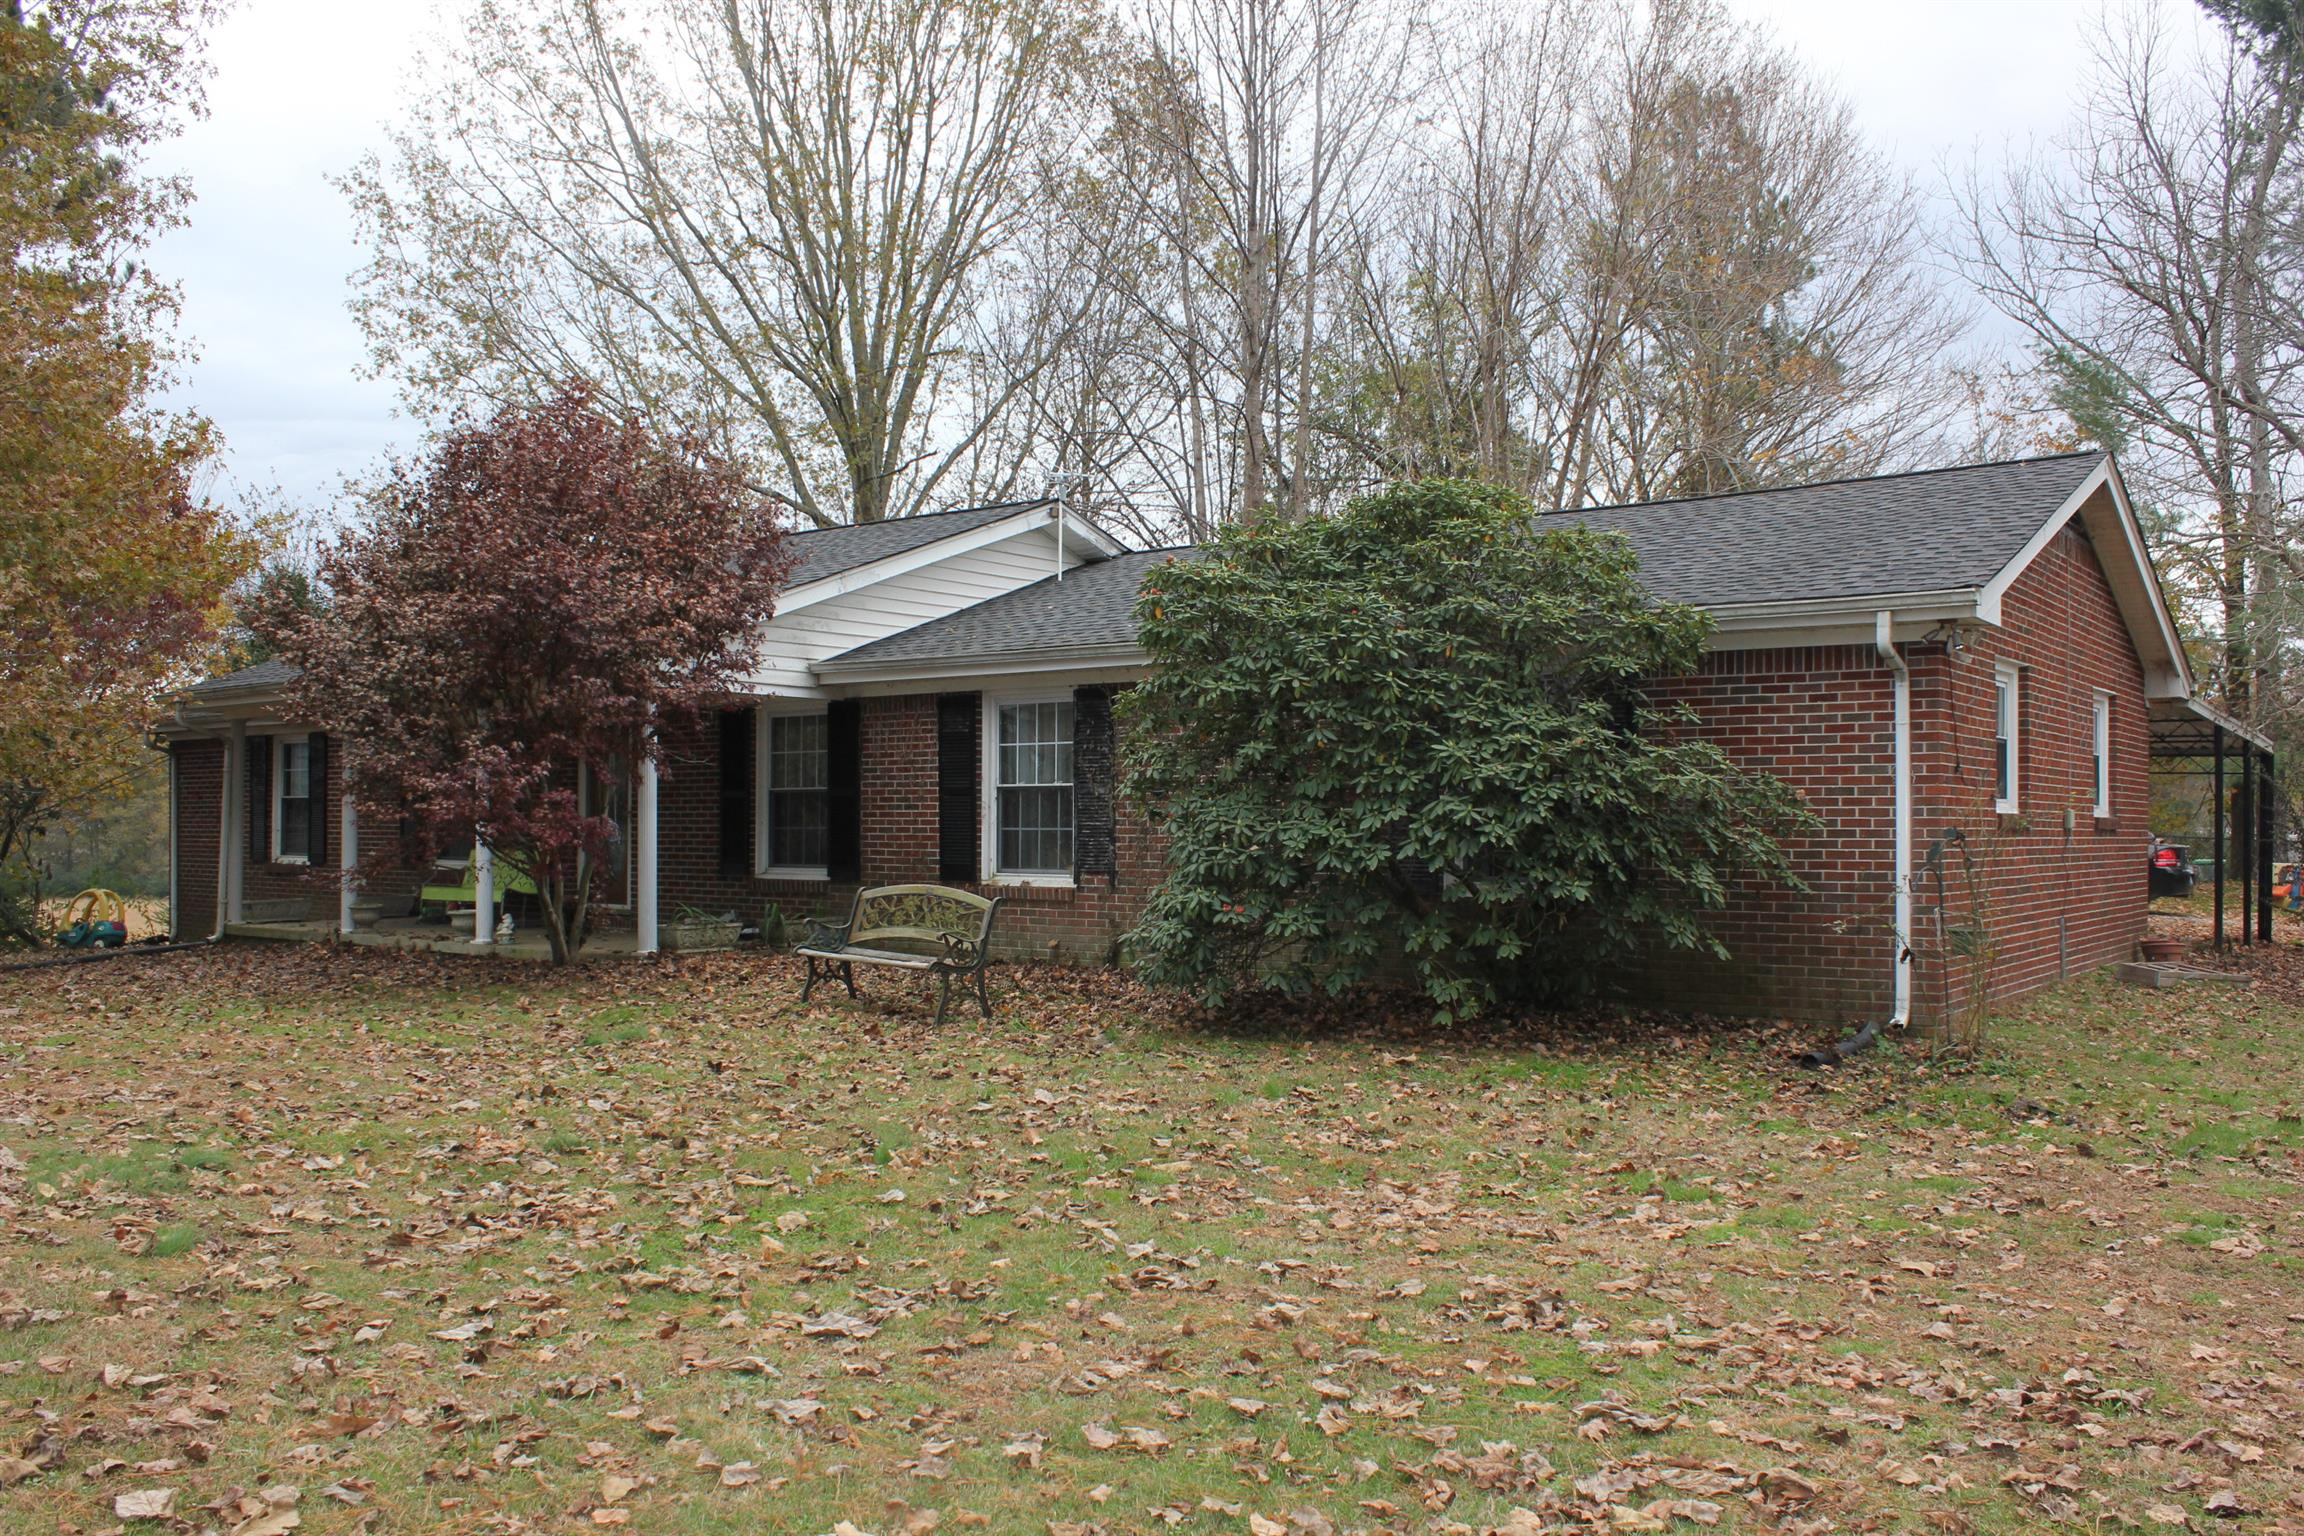 3599 Fuss Hollow Rd, Petersburg, TN 37144 - Petersburg, TN real estate listing